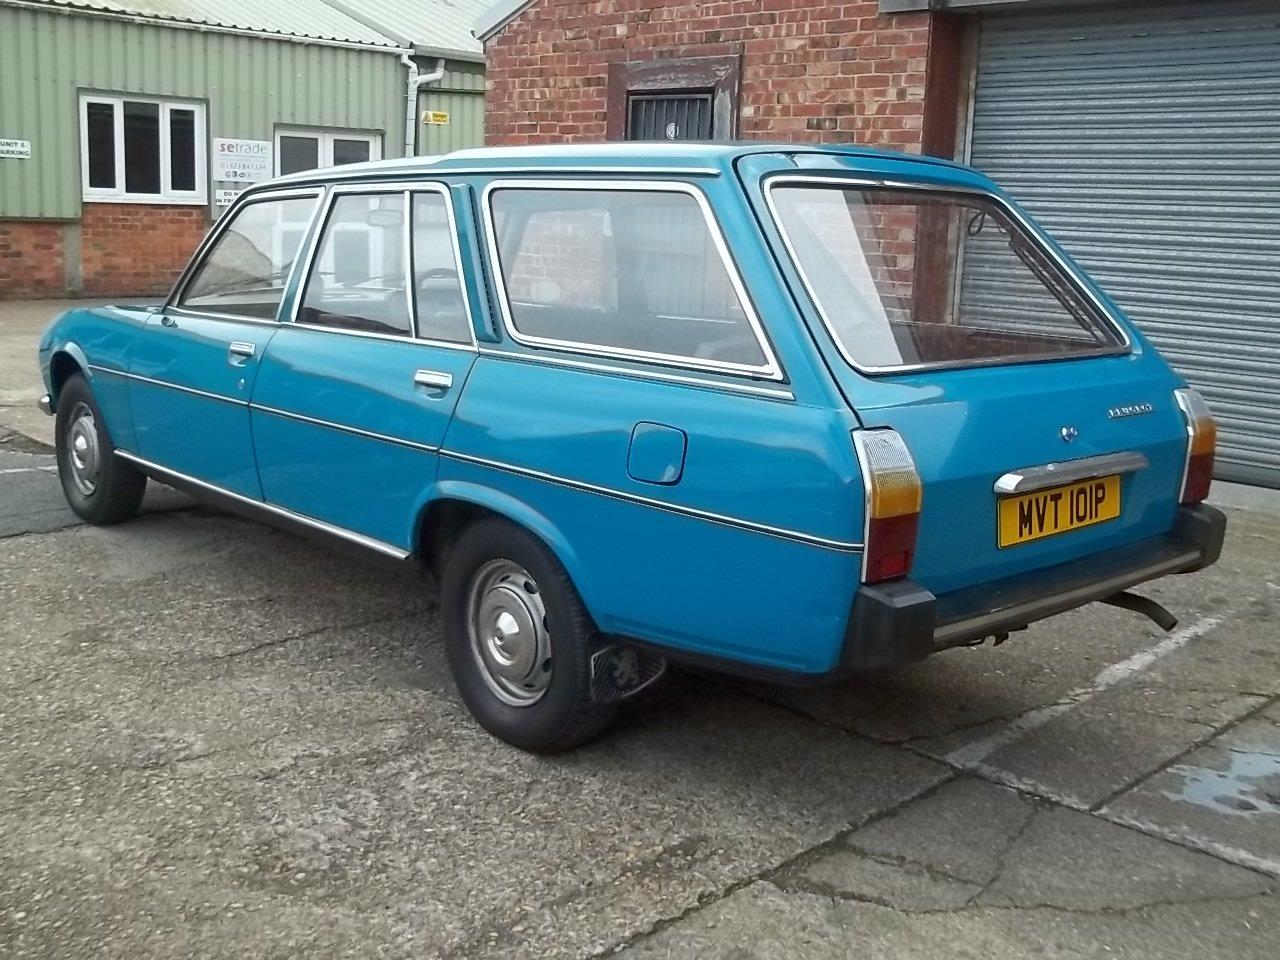 1976 Peugeot 504 2.0 Family Supplying Dealer + 1 owner SOLD (picture 2 of 6)